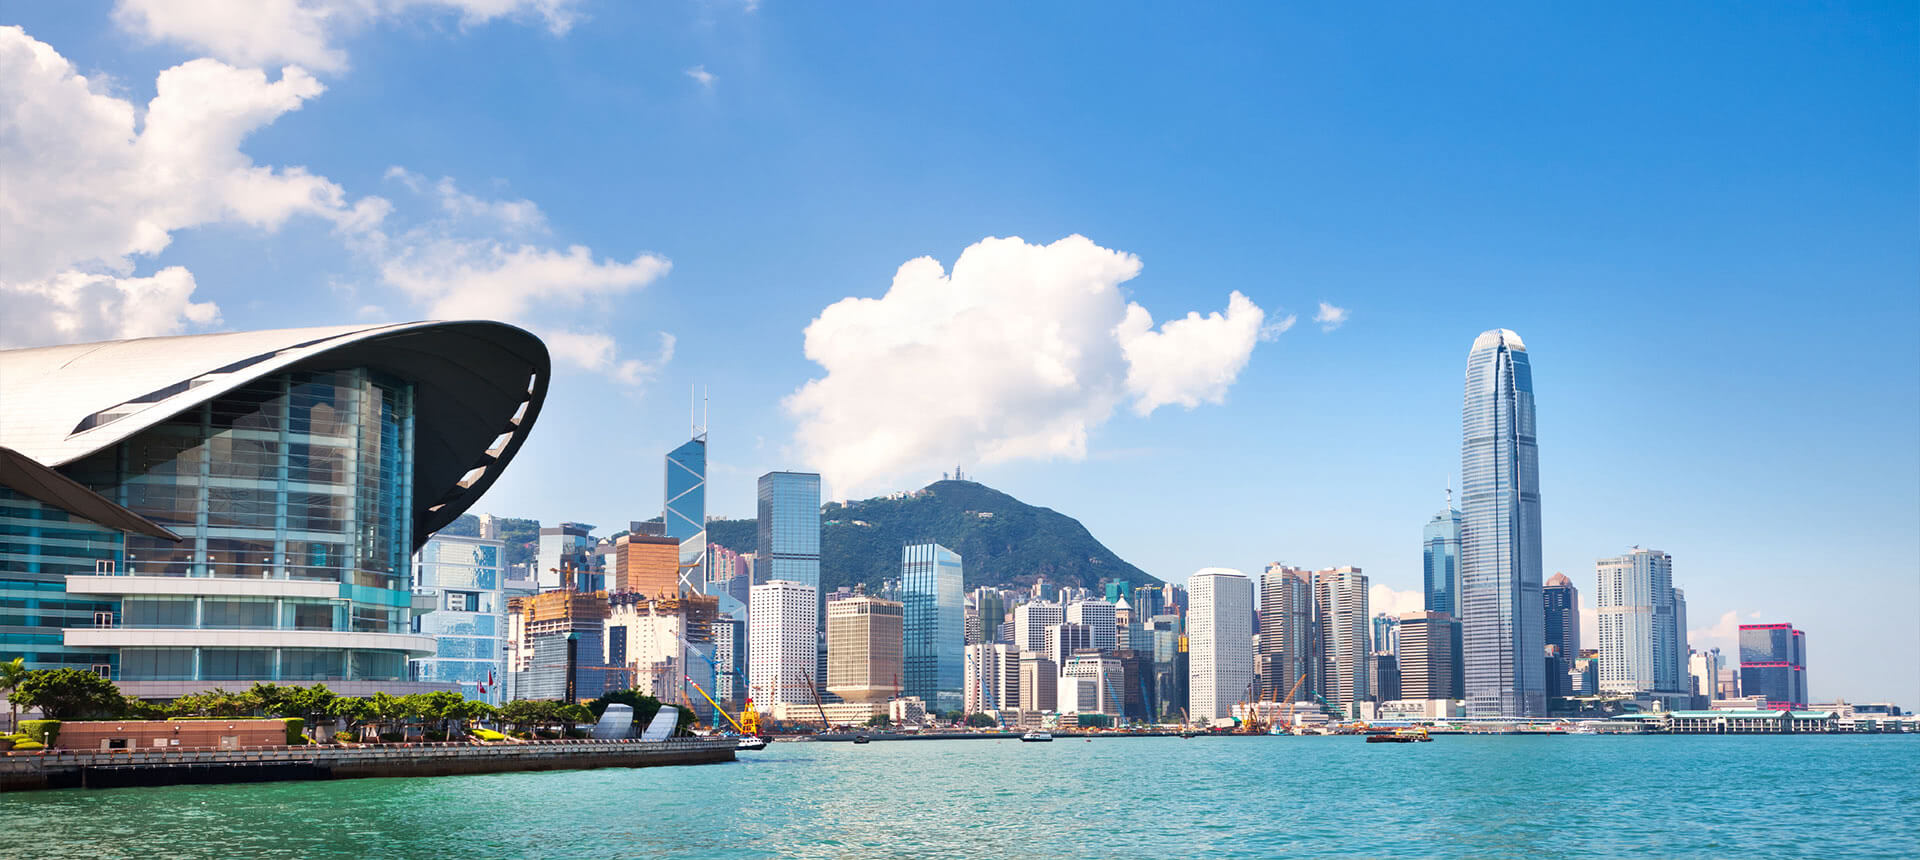 Hong Kong Name Of Island